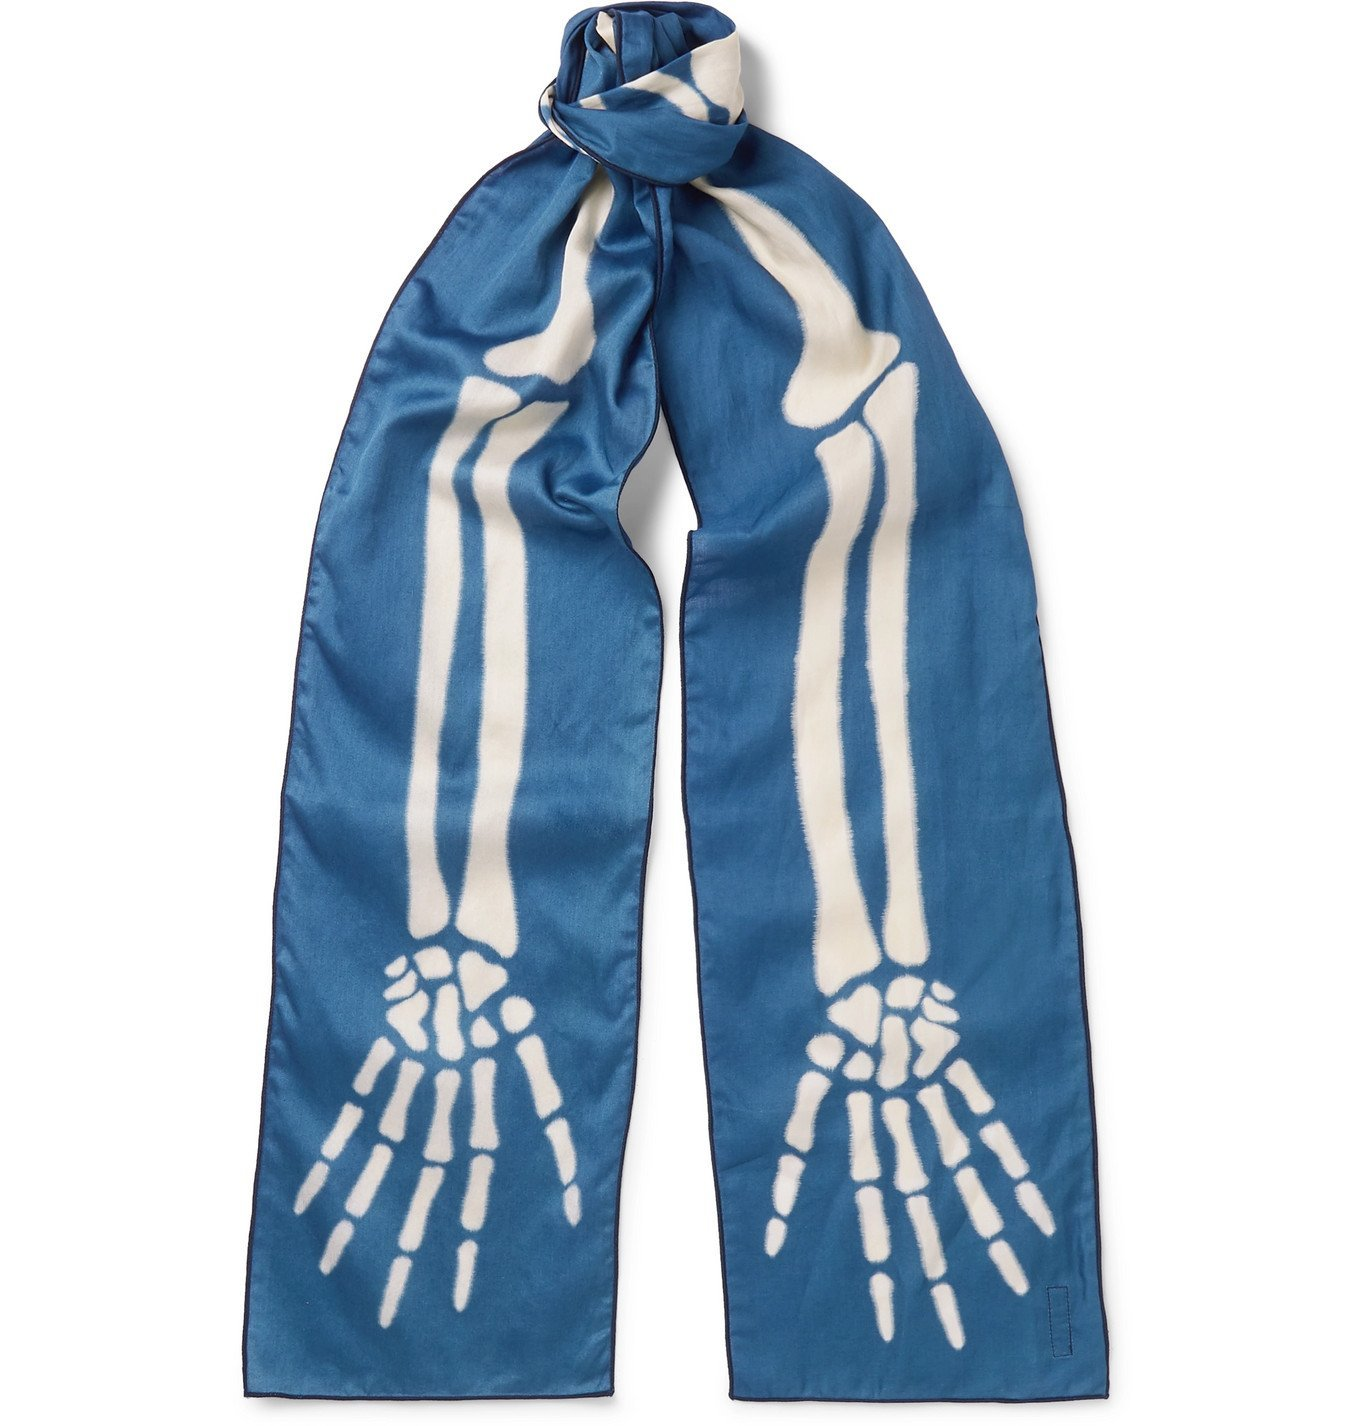 KAPITAL - Printed Cotton-Gauze Scarf - Blue